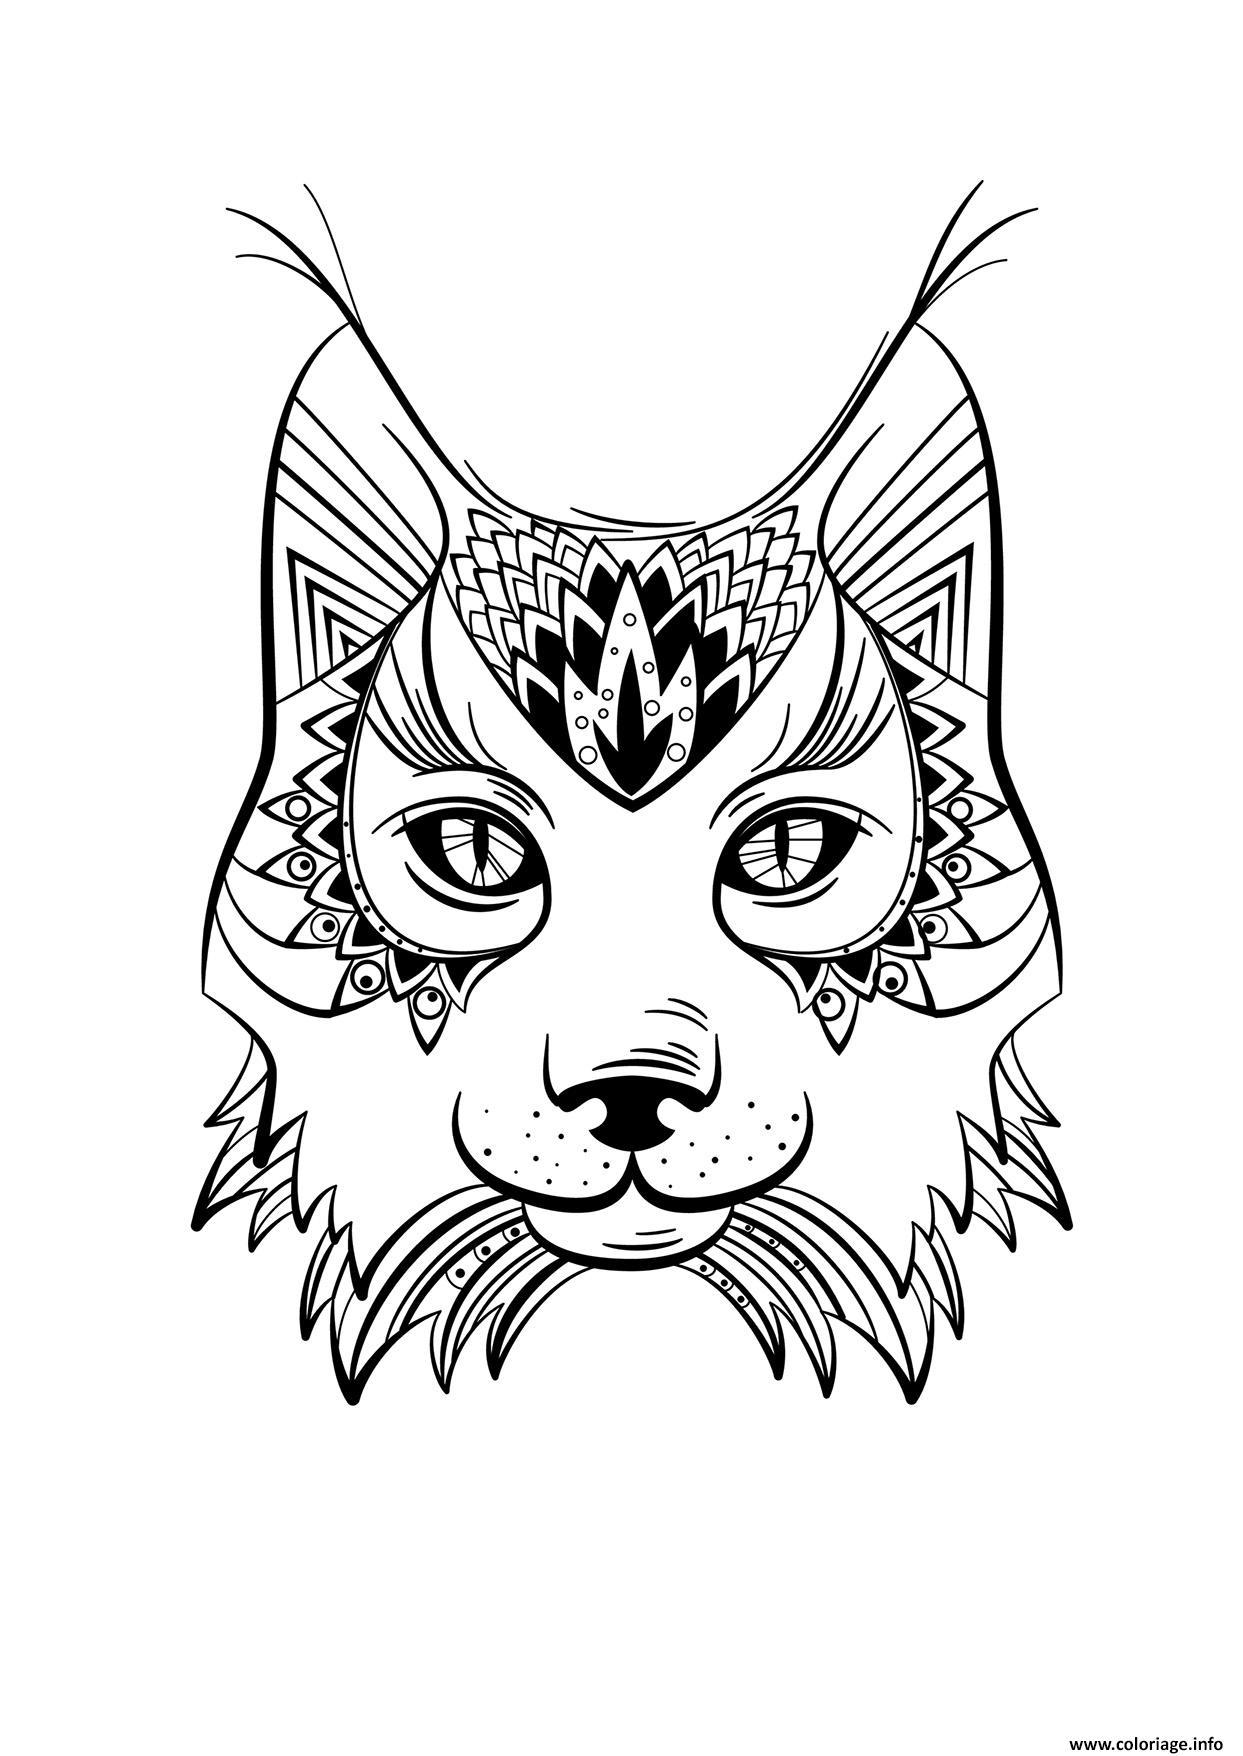 Coloriage Lynx Animal Adulte Mandala Dessin